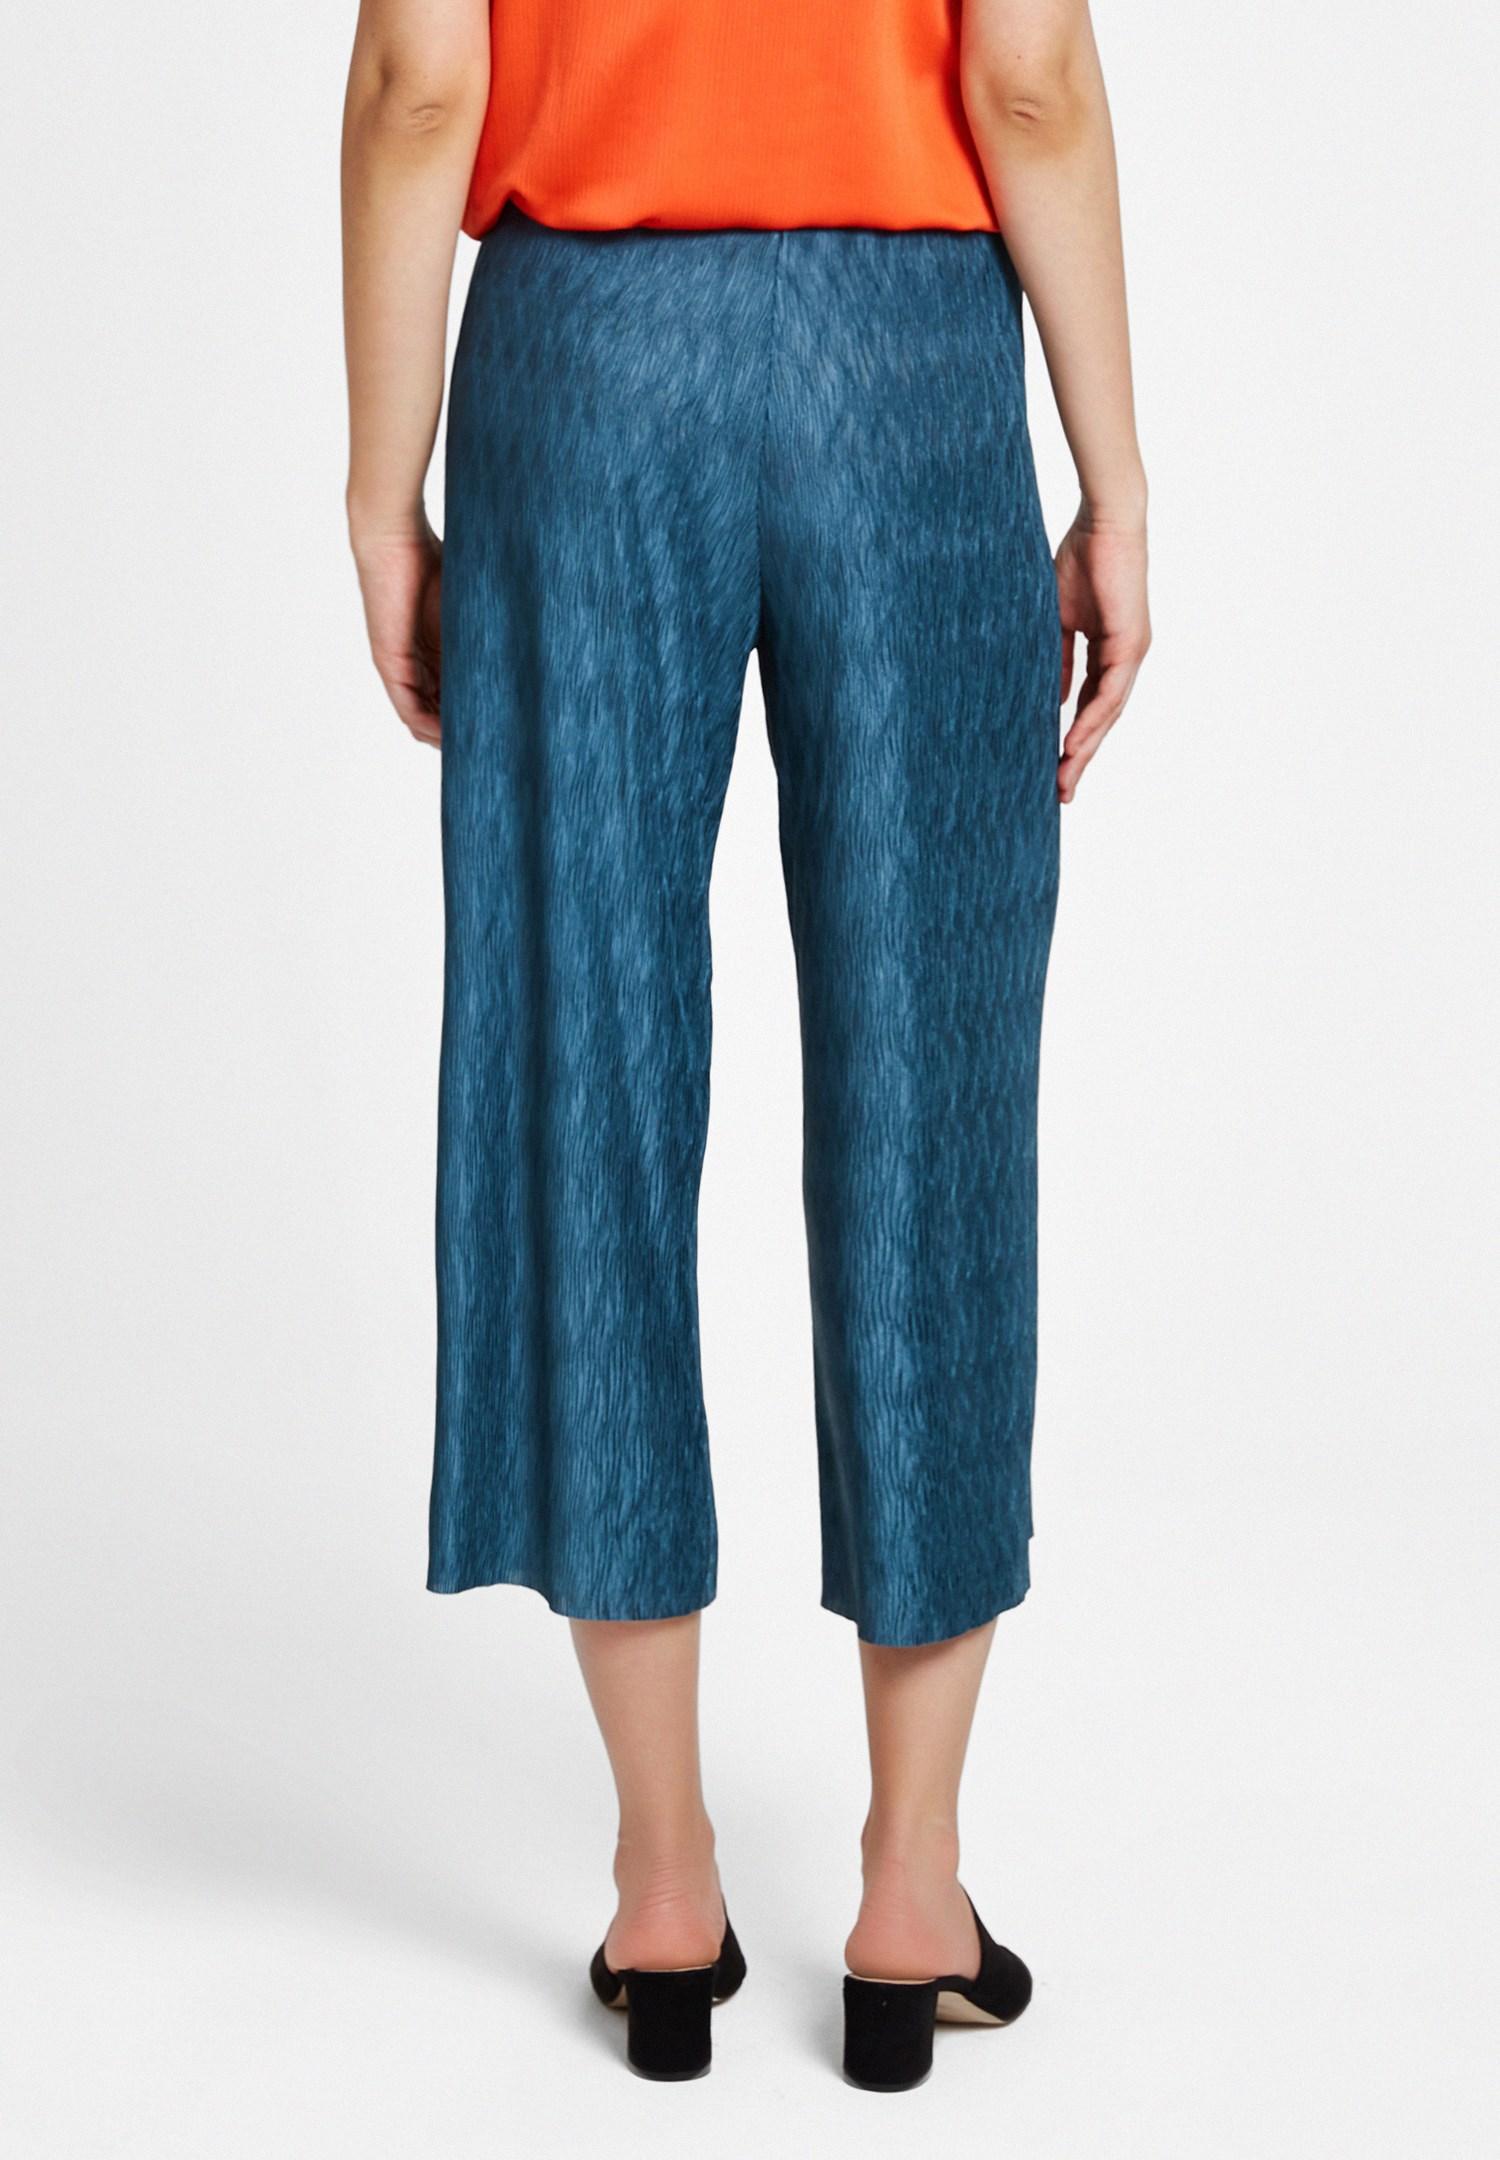 Bayan Yeşil Pili Detaylı Pantolon